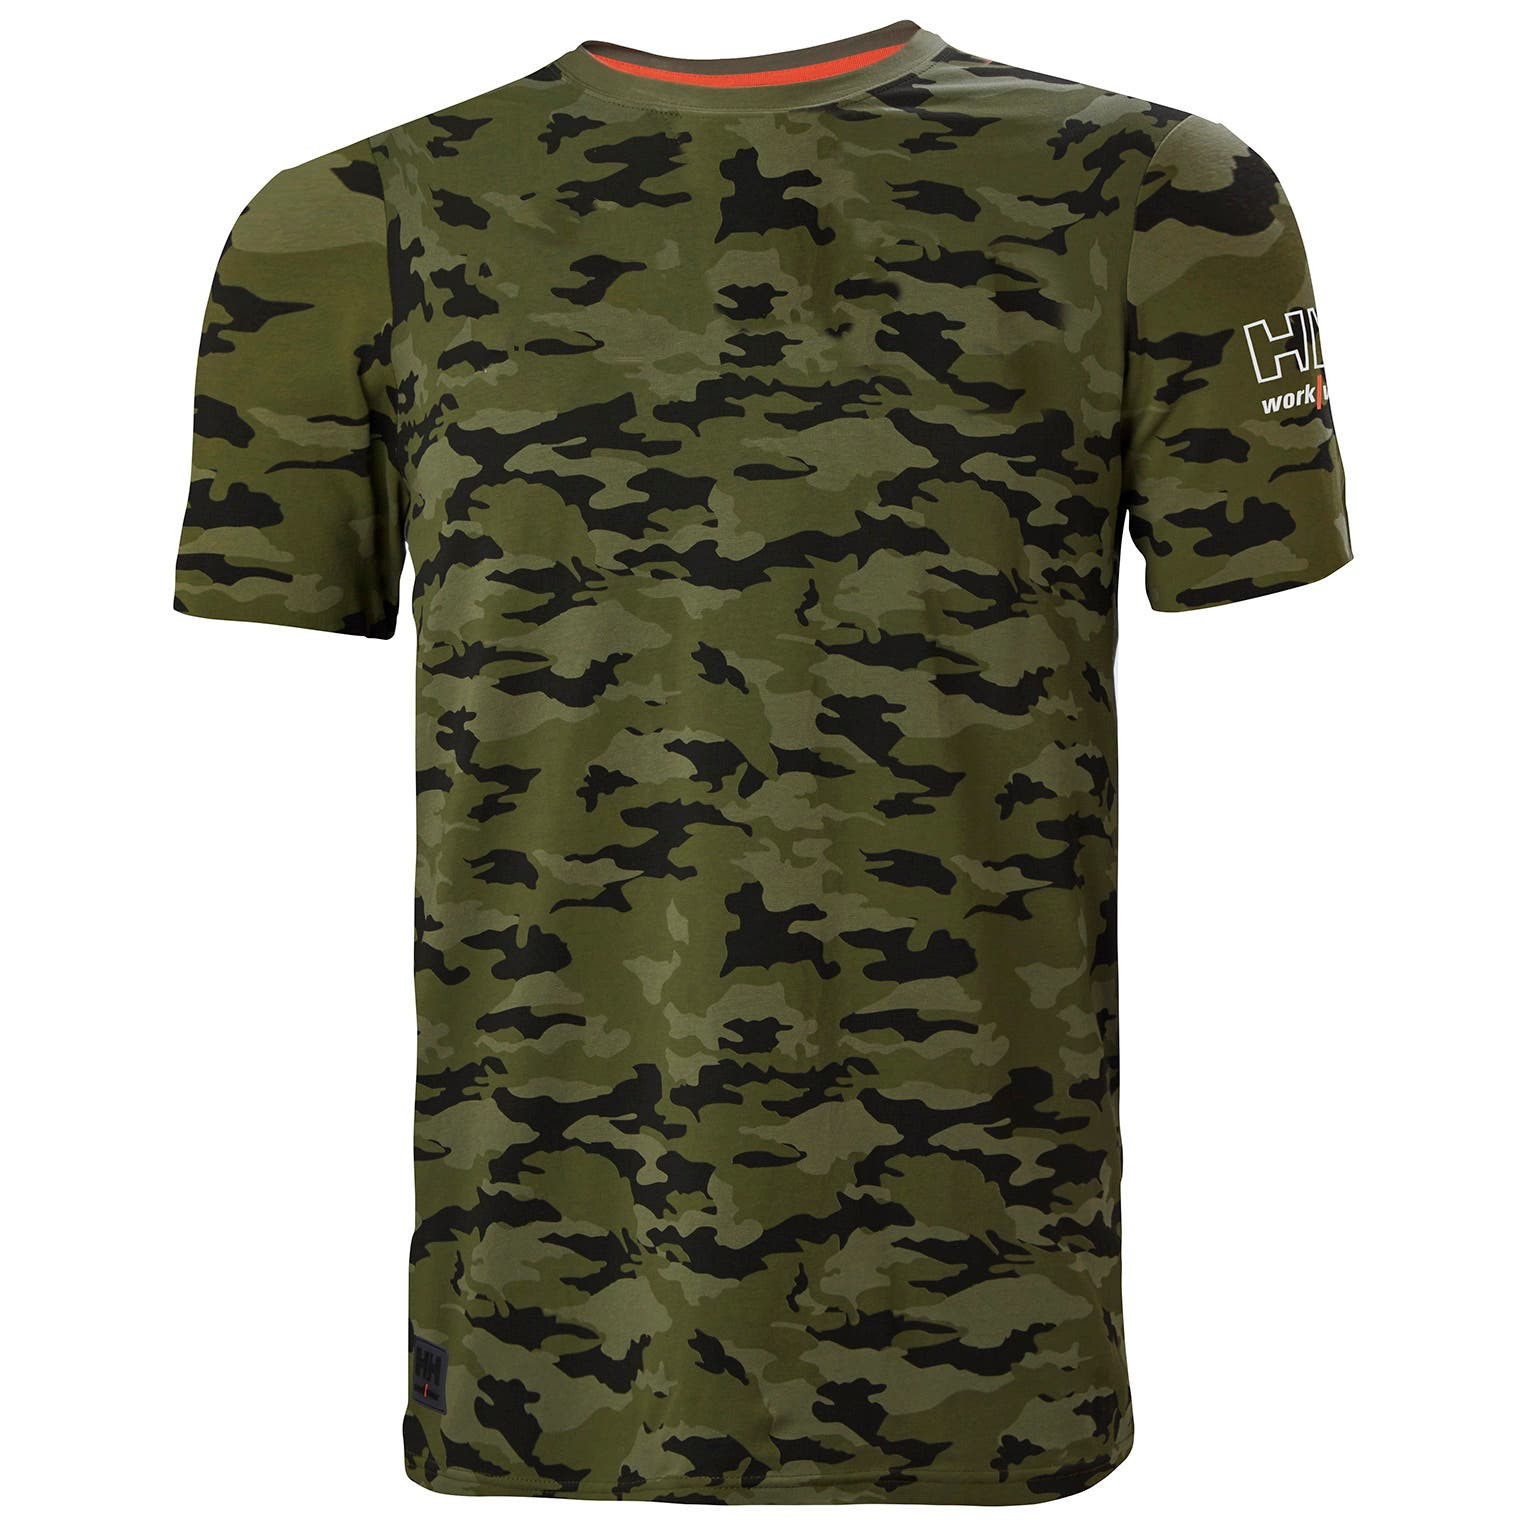 Футболка Helly Hansen Kensington T-Shirt - 79246 (Camo, L)